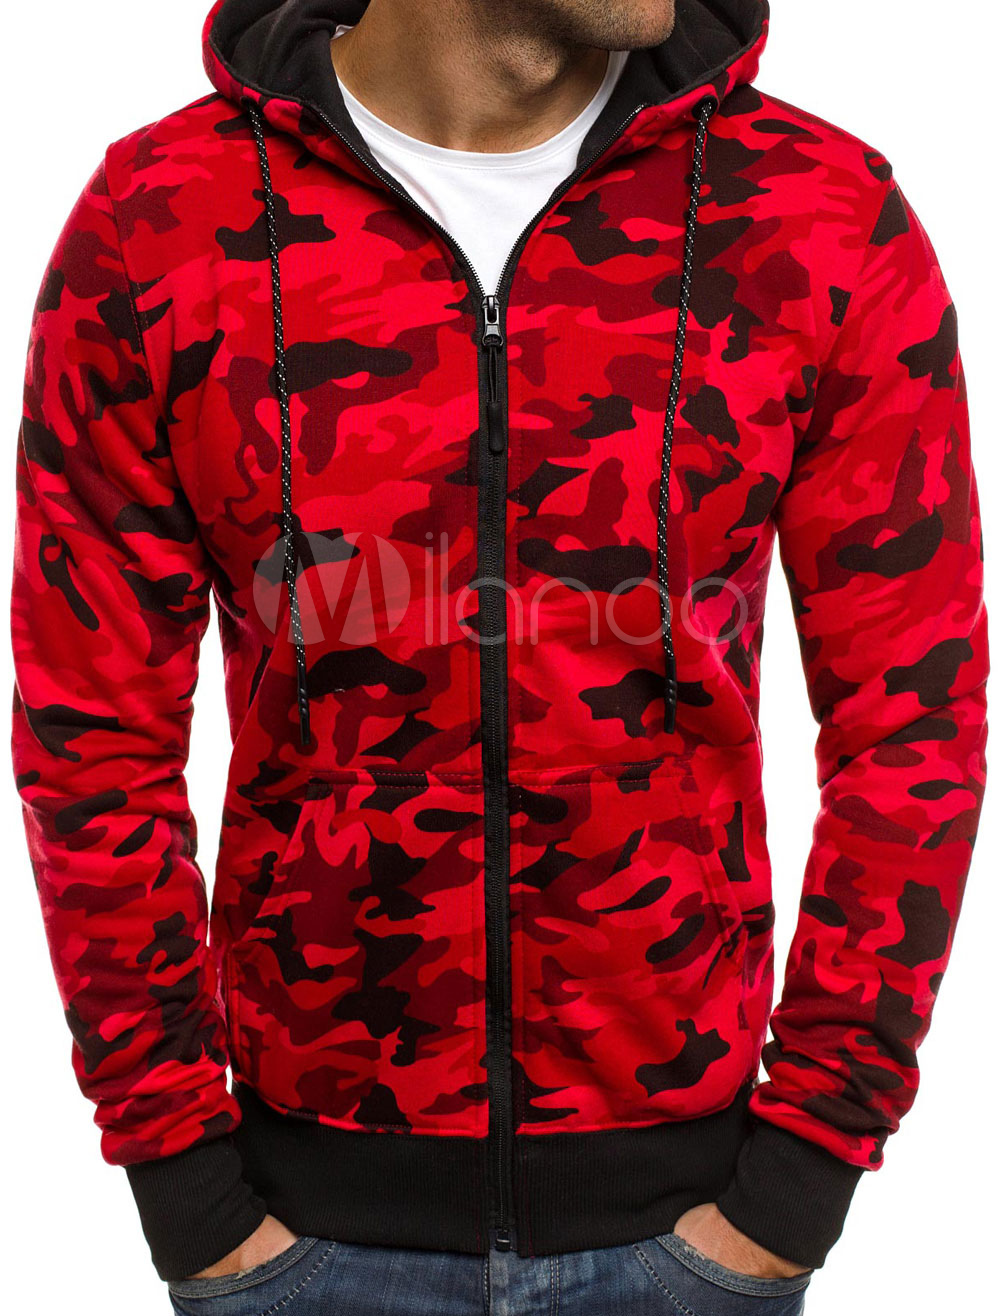 9b12c013dd4dc ... Long Sleeve Hoodie Camo Print Cuff Zipper Up Hooded Men Sweatshirt-No.3  ...